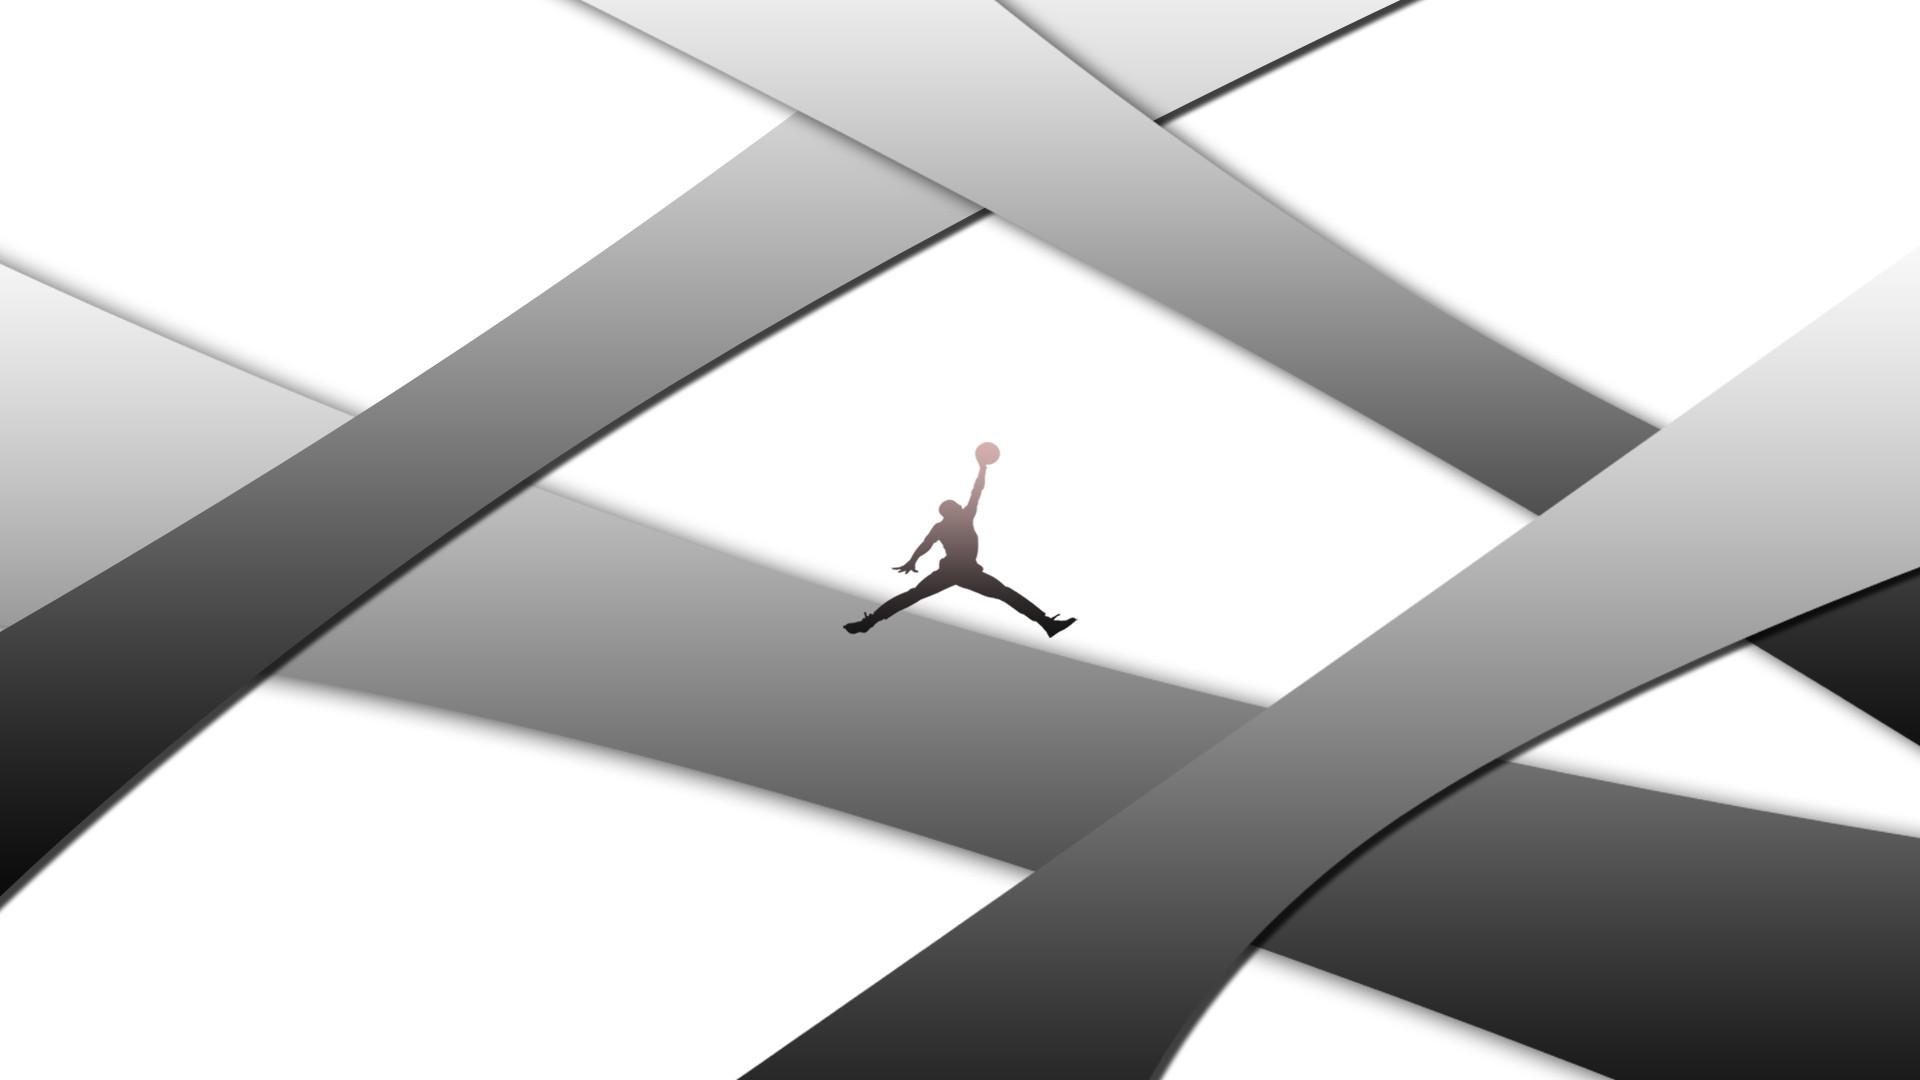 Air Jordan Wallpaper Iphone 4 Air Jordan Logo Wallpaper 183 ①